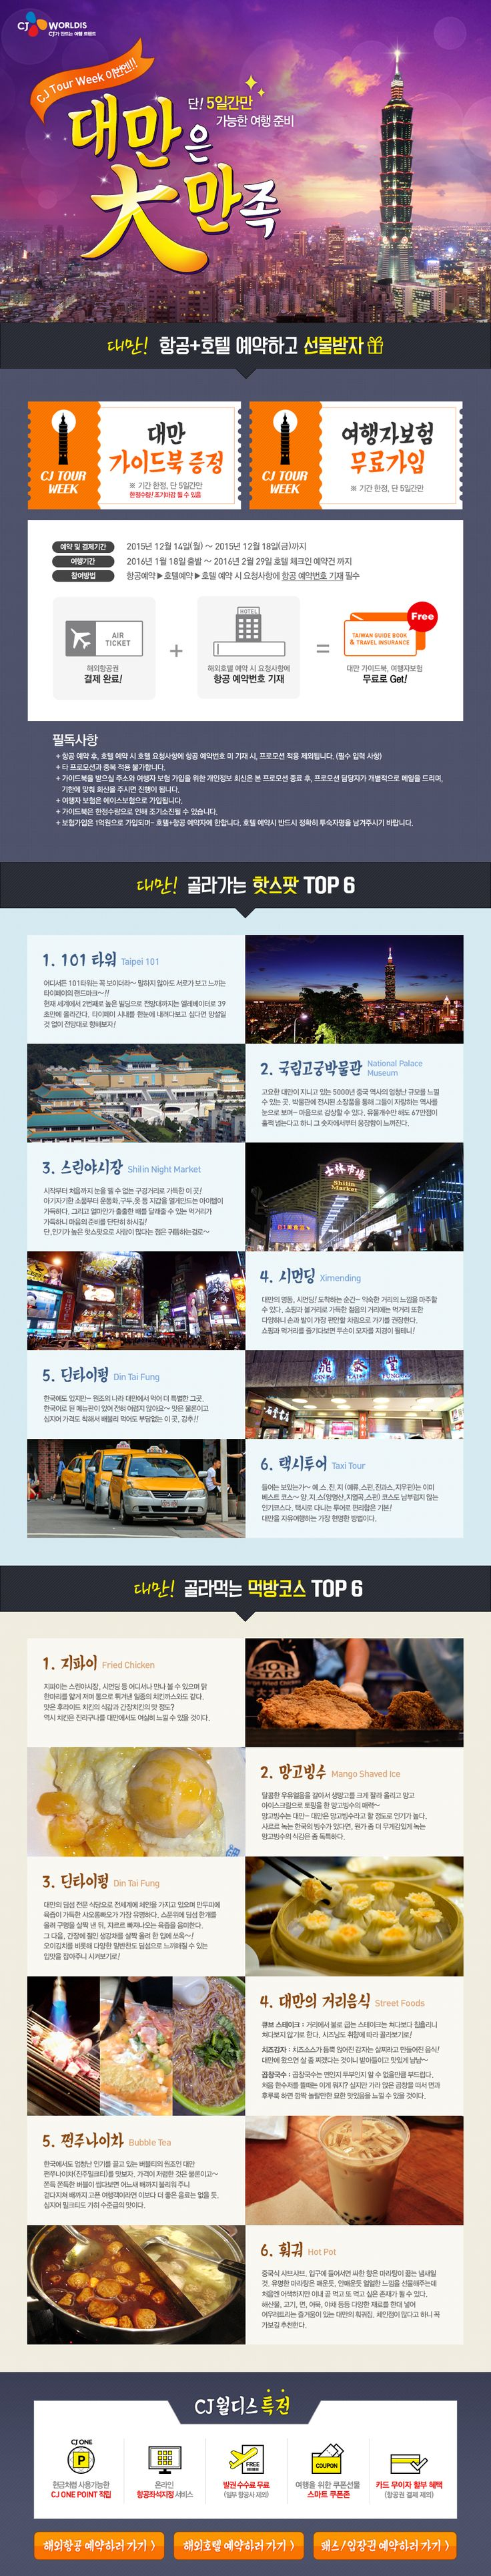 CJ월디스 CJ TOUR WEEK 대만 이벤트 기획전